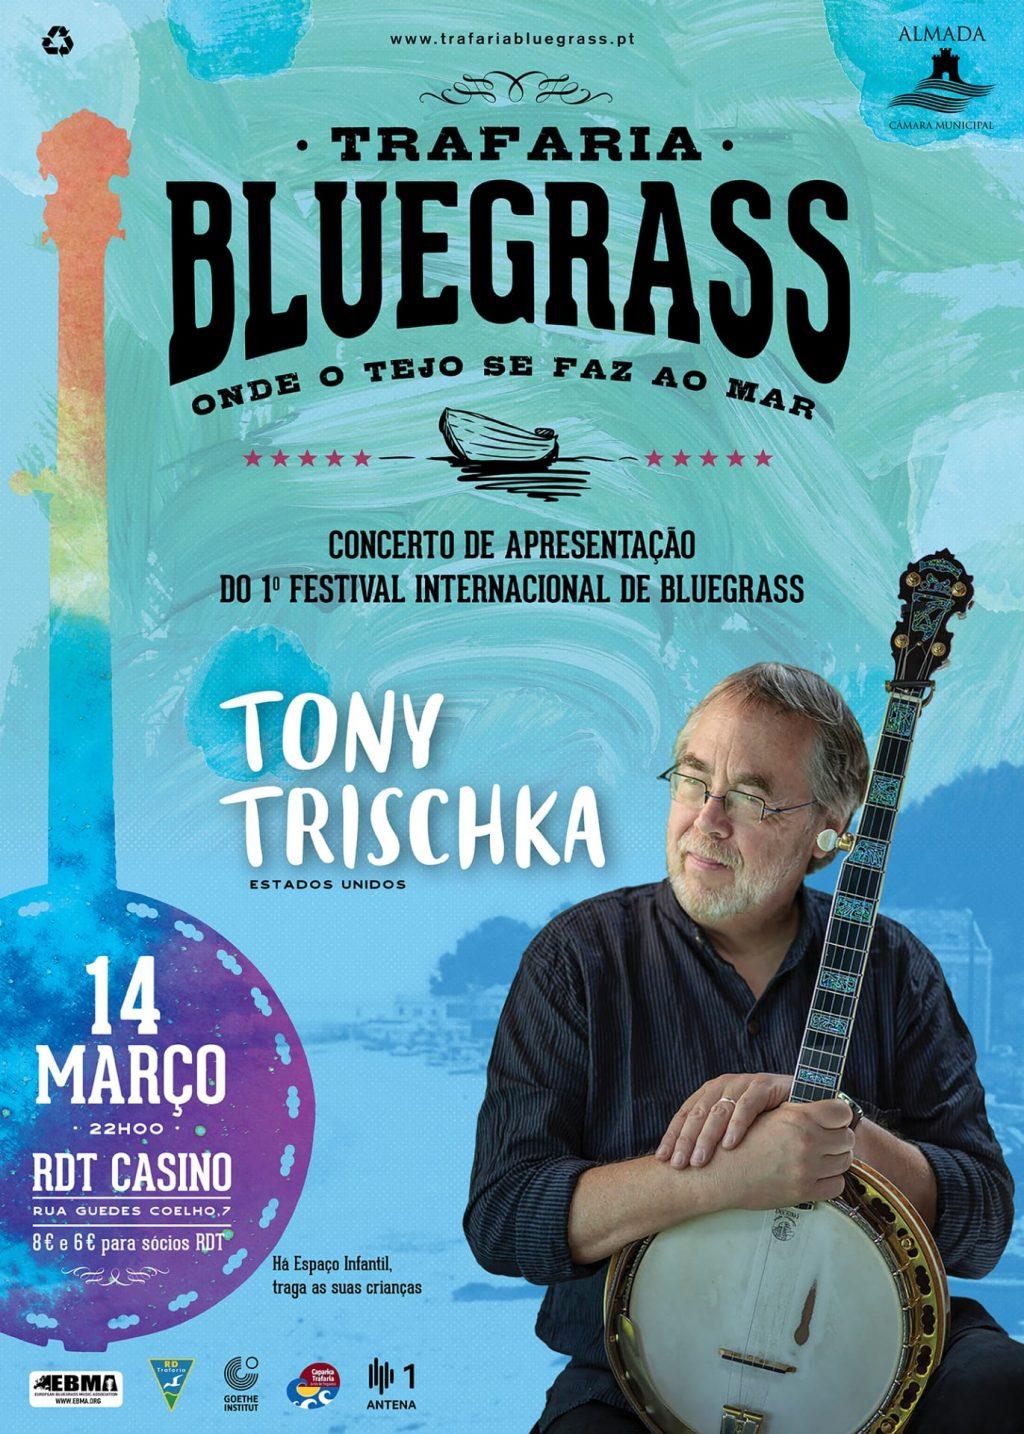 Tony Trischka | Trafaria Bluegrass | 14 de Março | RDTCasino